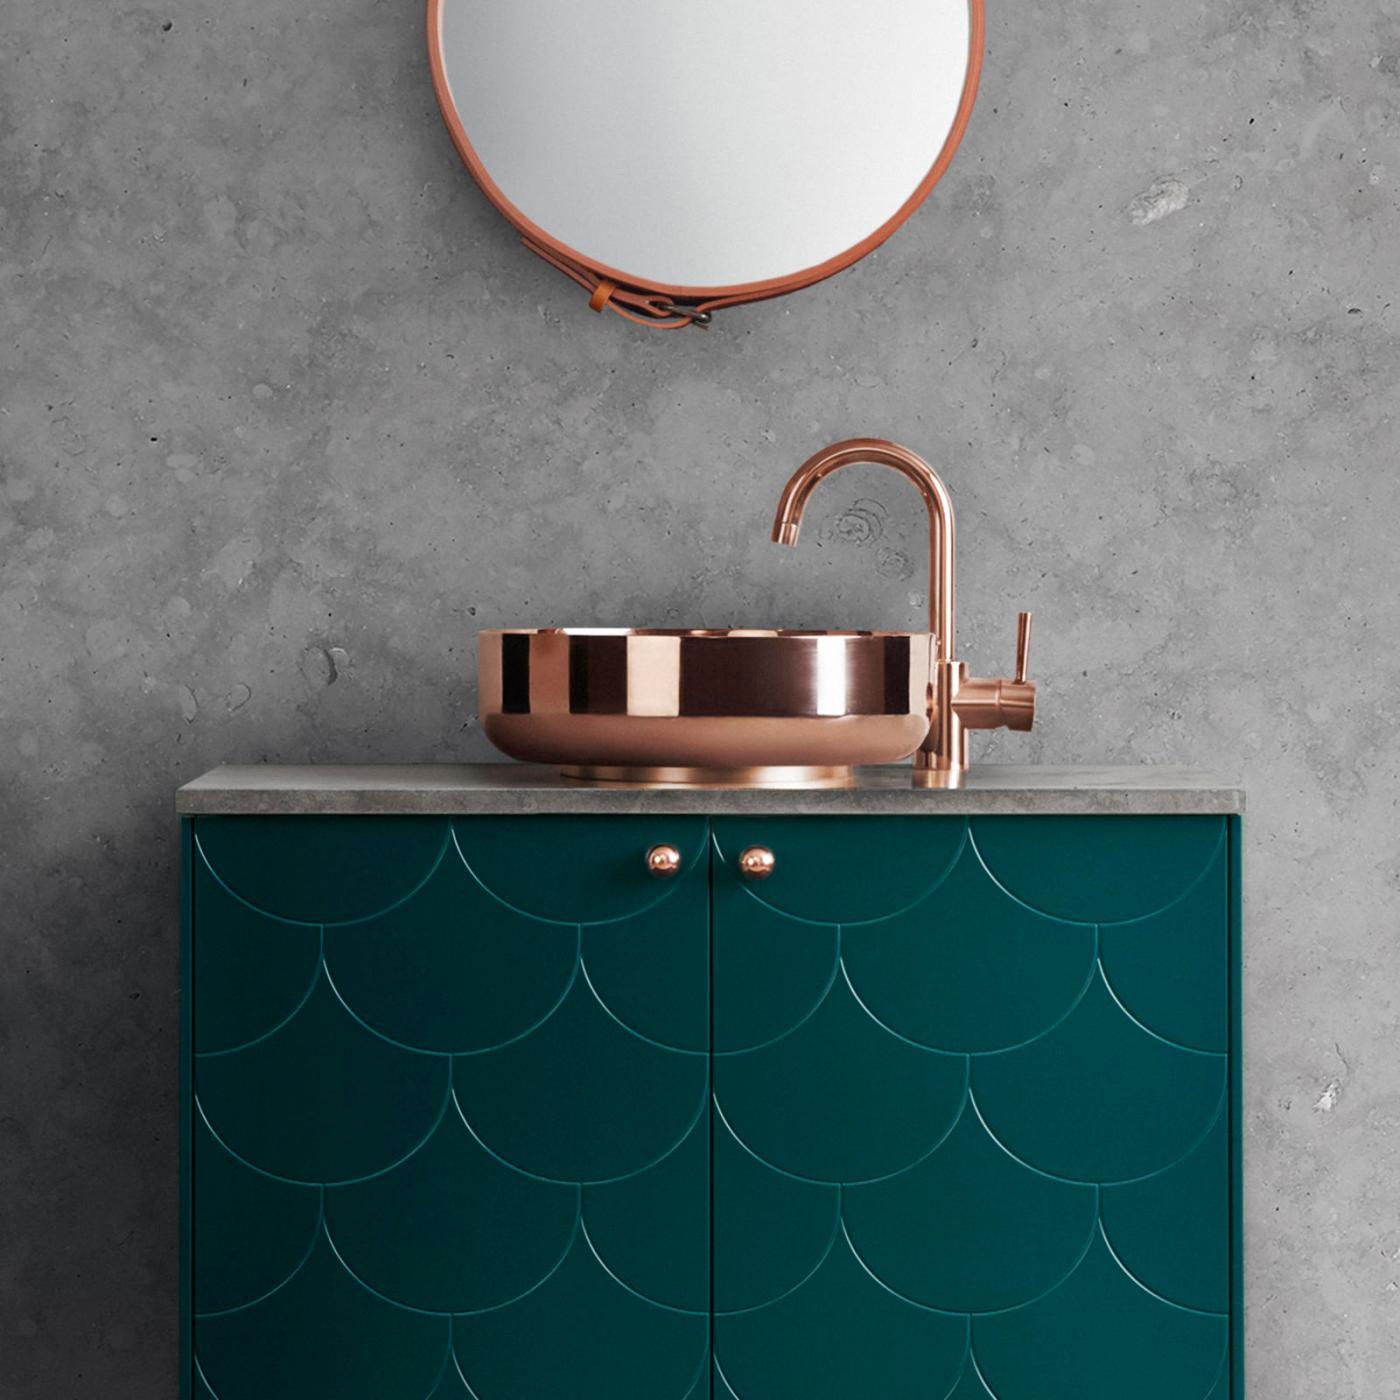 superfront-vanity-unit-bathroom-big-fish-pattern-bottle-green-copper-sink-tap-handle-limestone-top.jpg